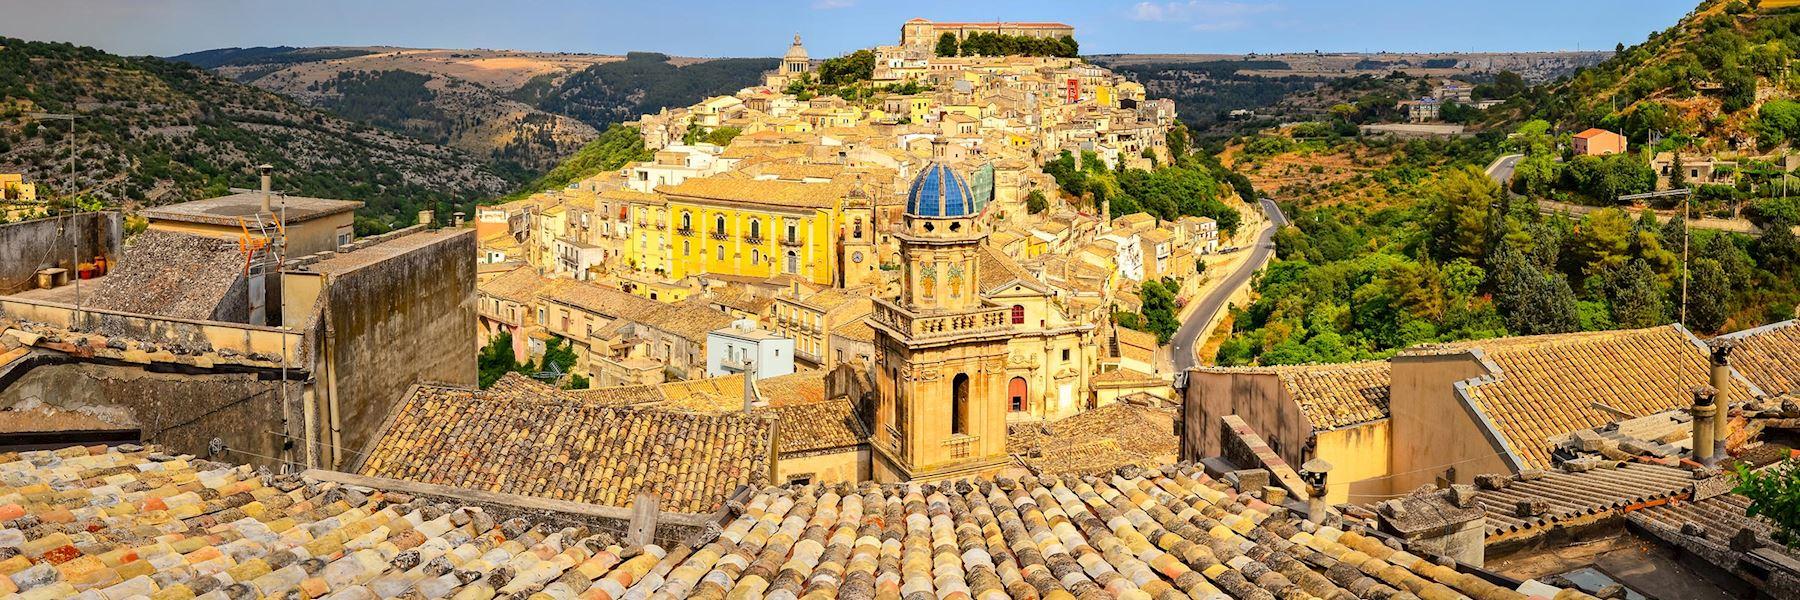 Visit Ragusa, Modica & Noto, Italy